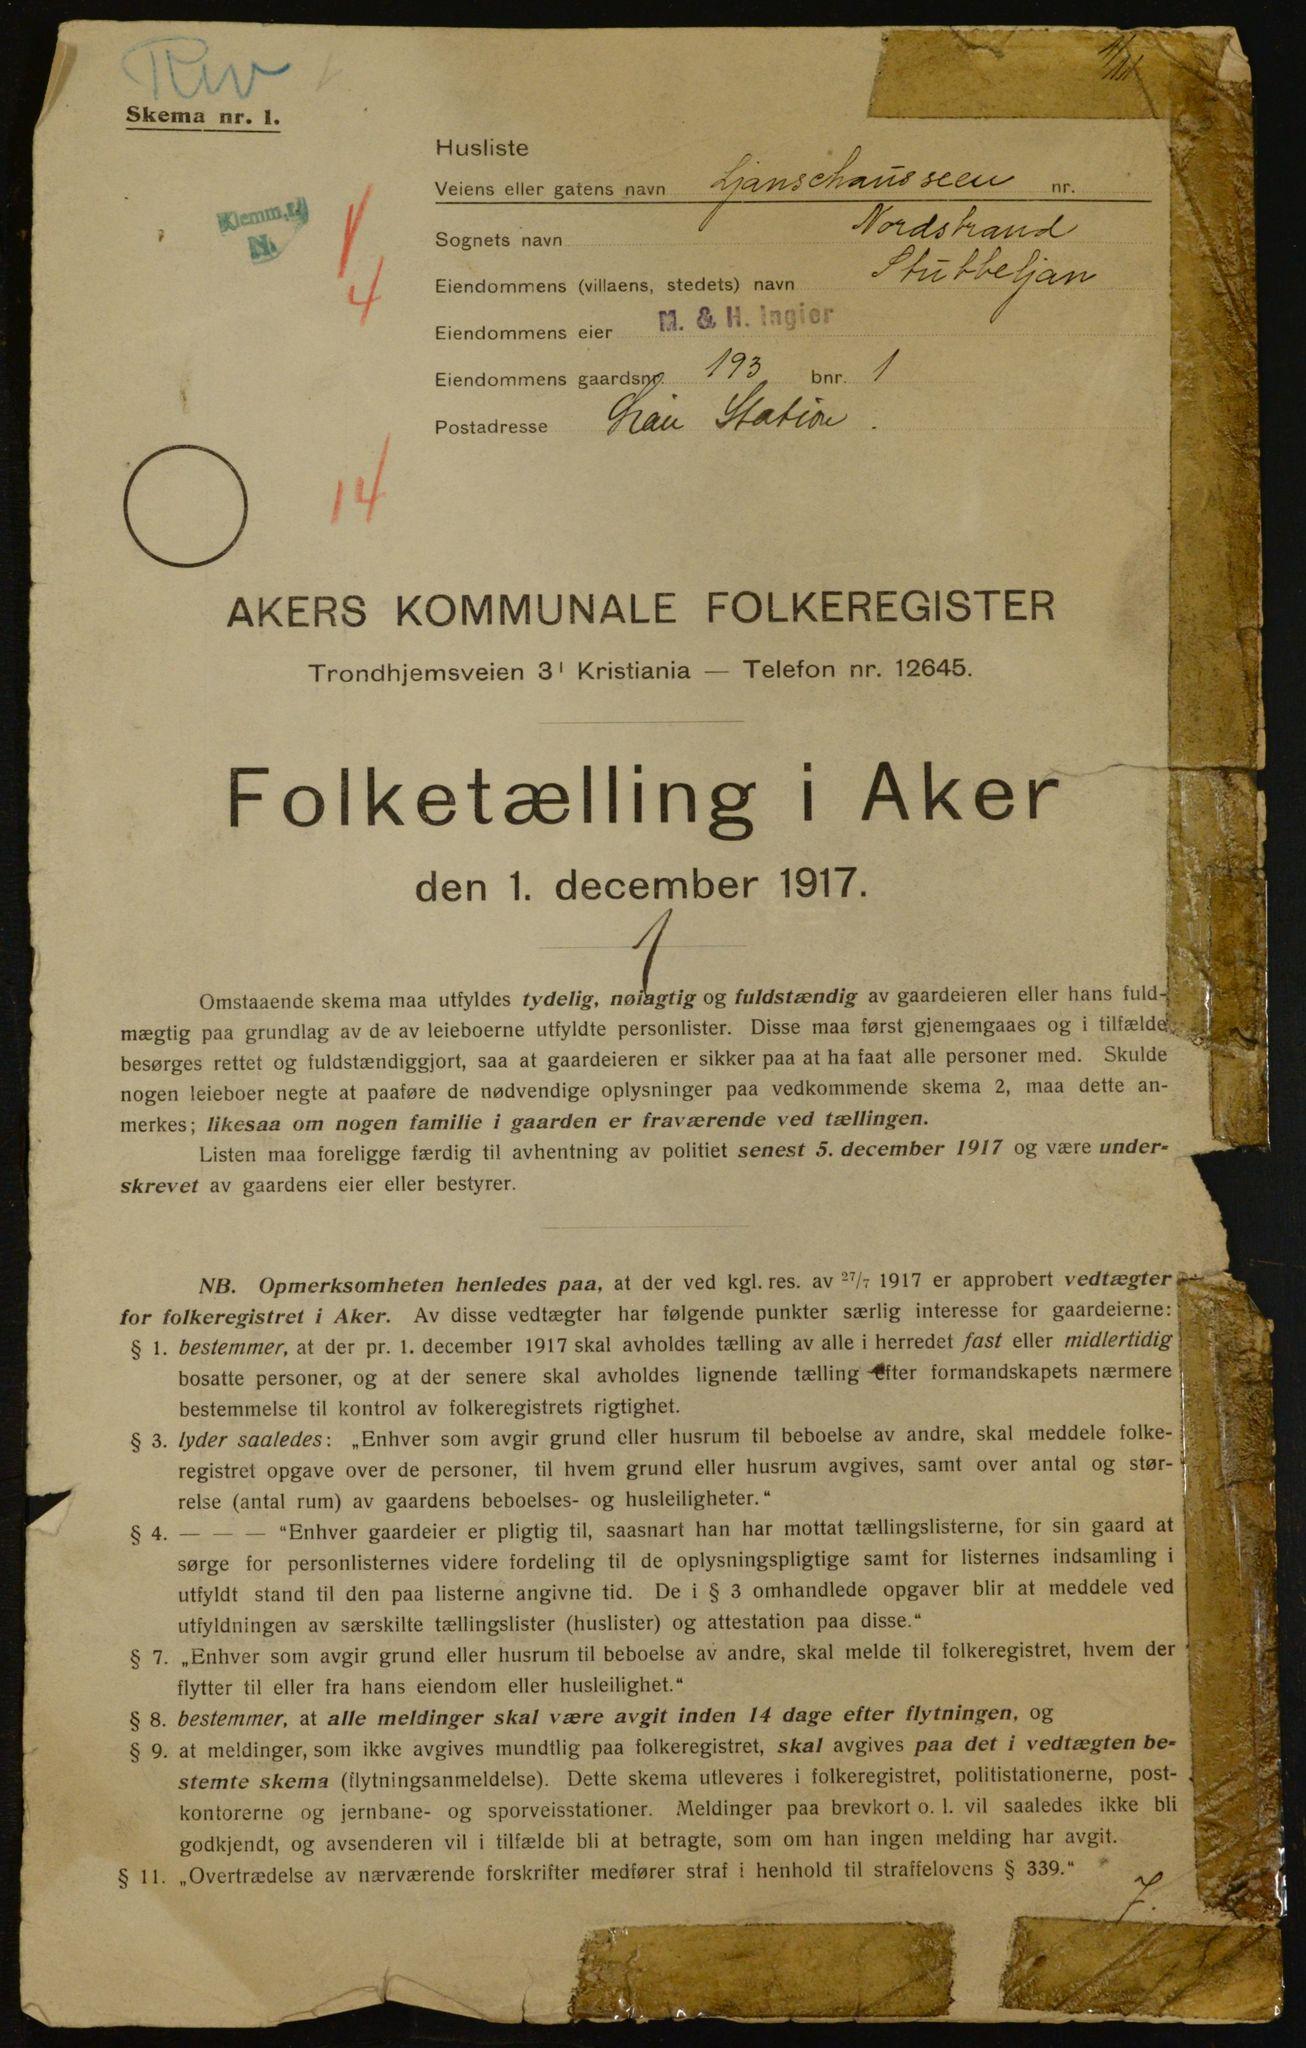 OBA, 1917 census for Aker, 1917, p. 16223